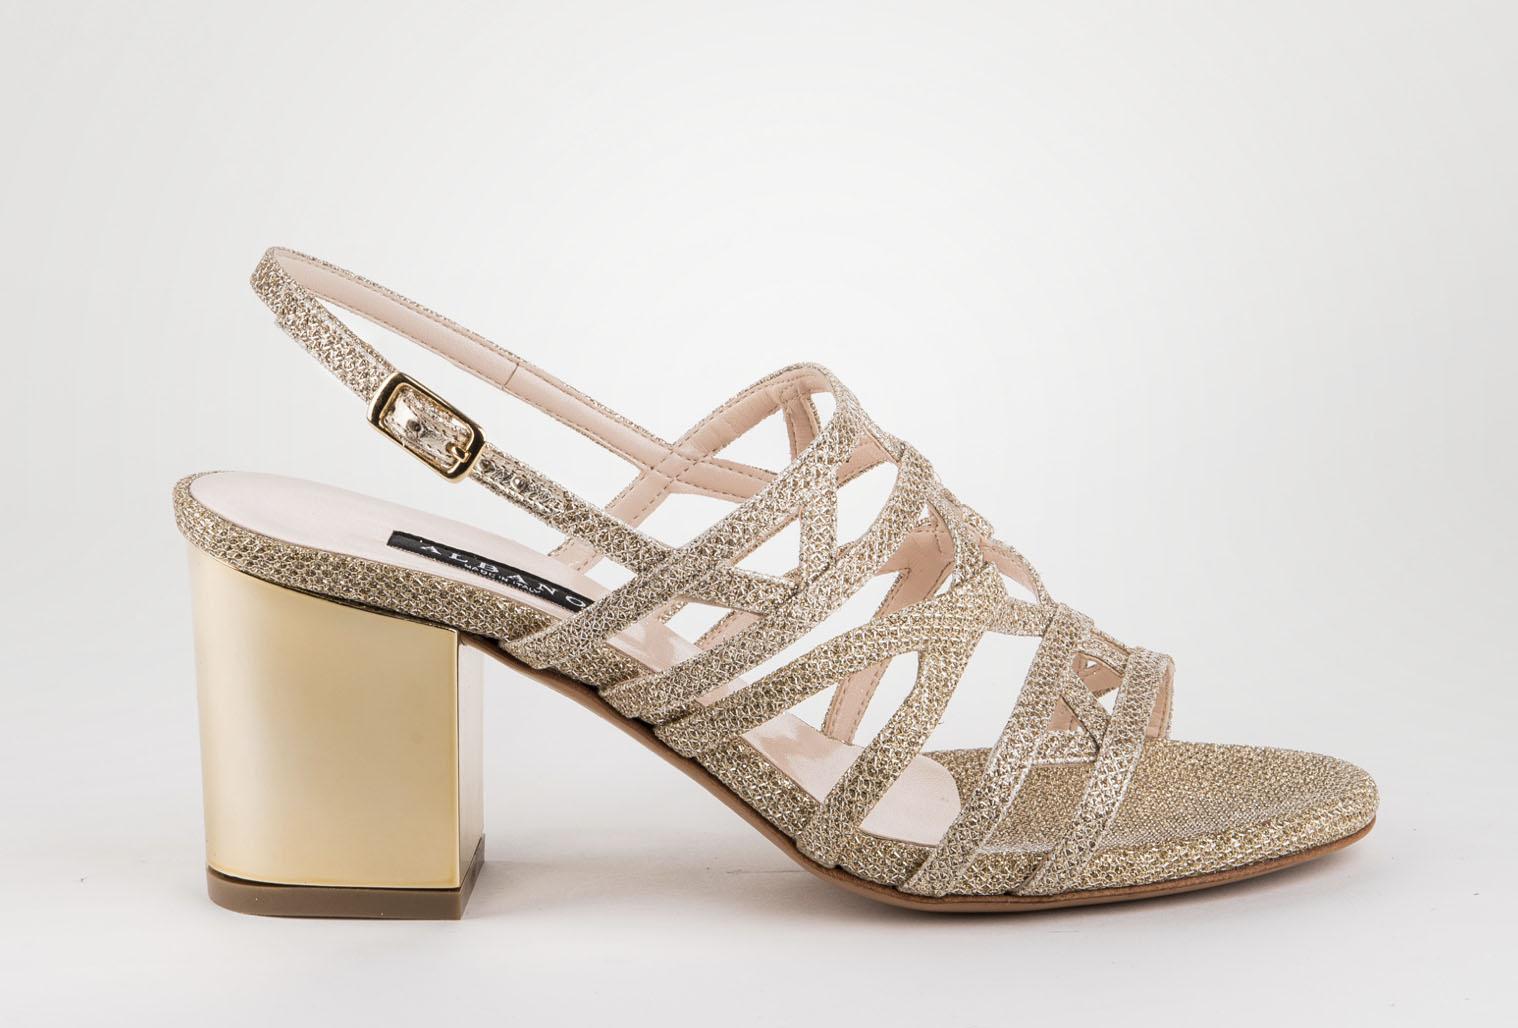 foto ecommerce scarpe esempio